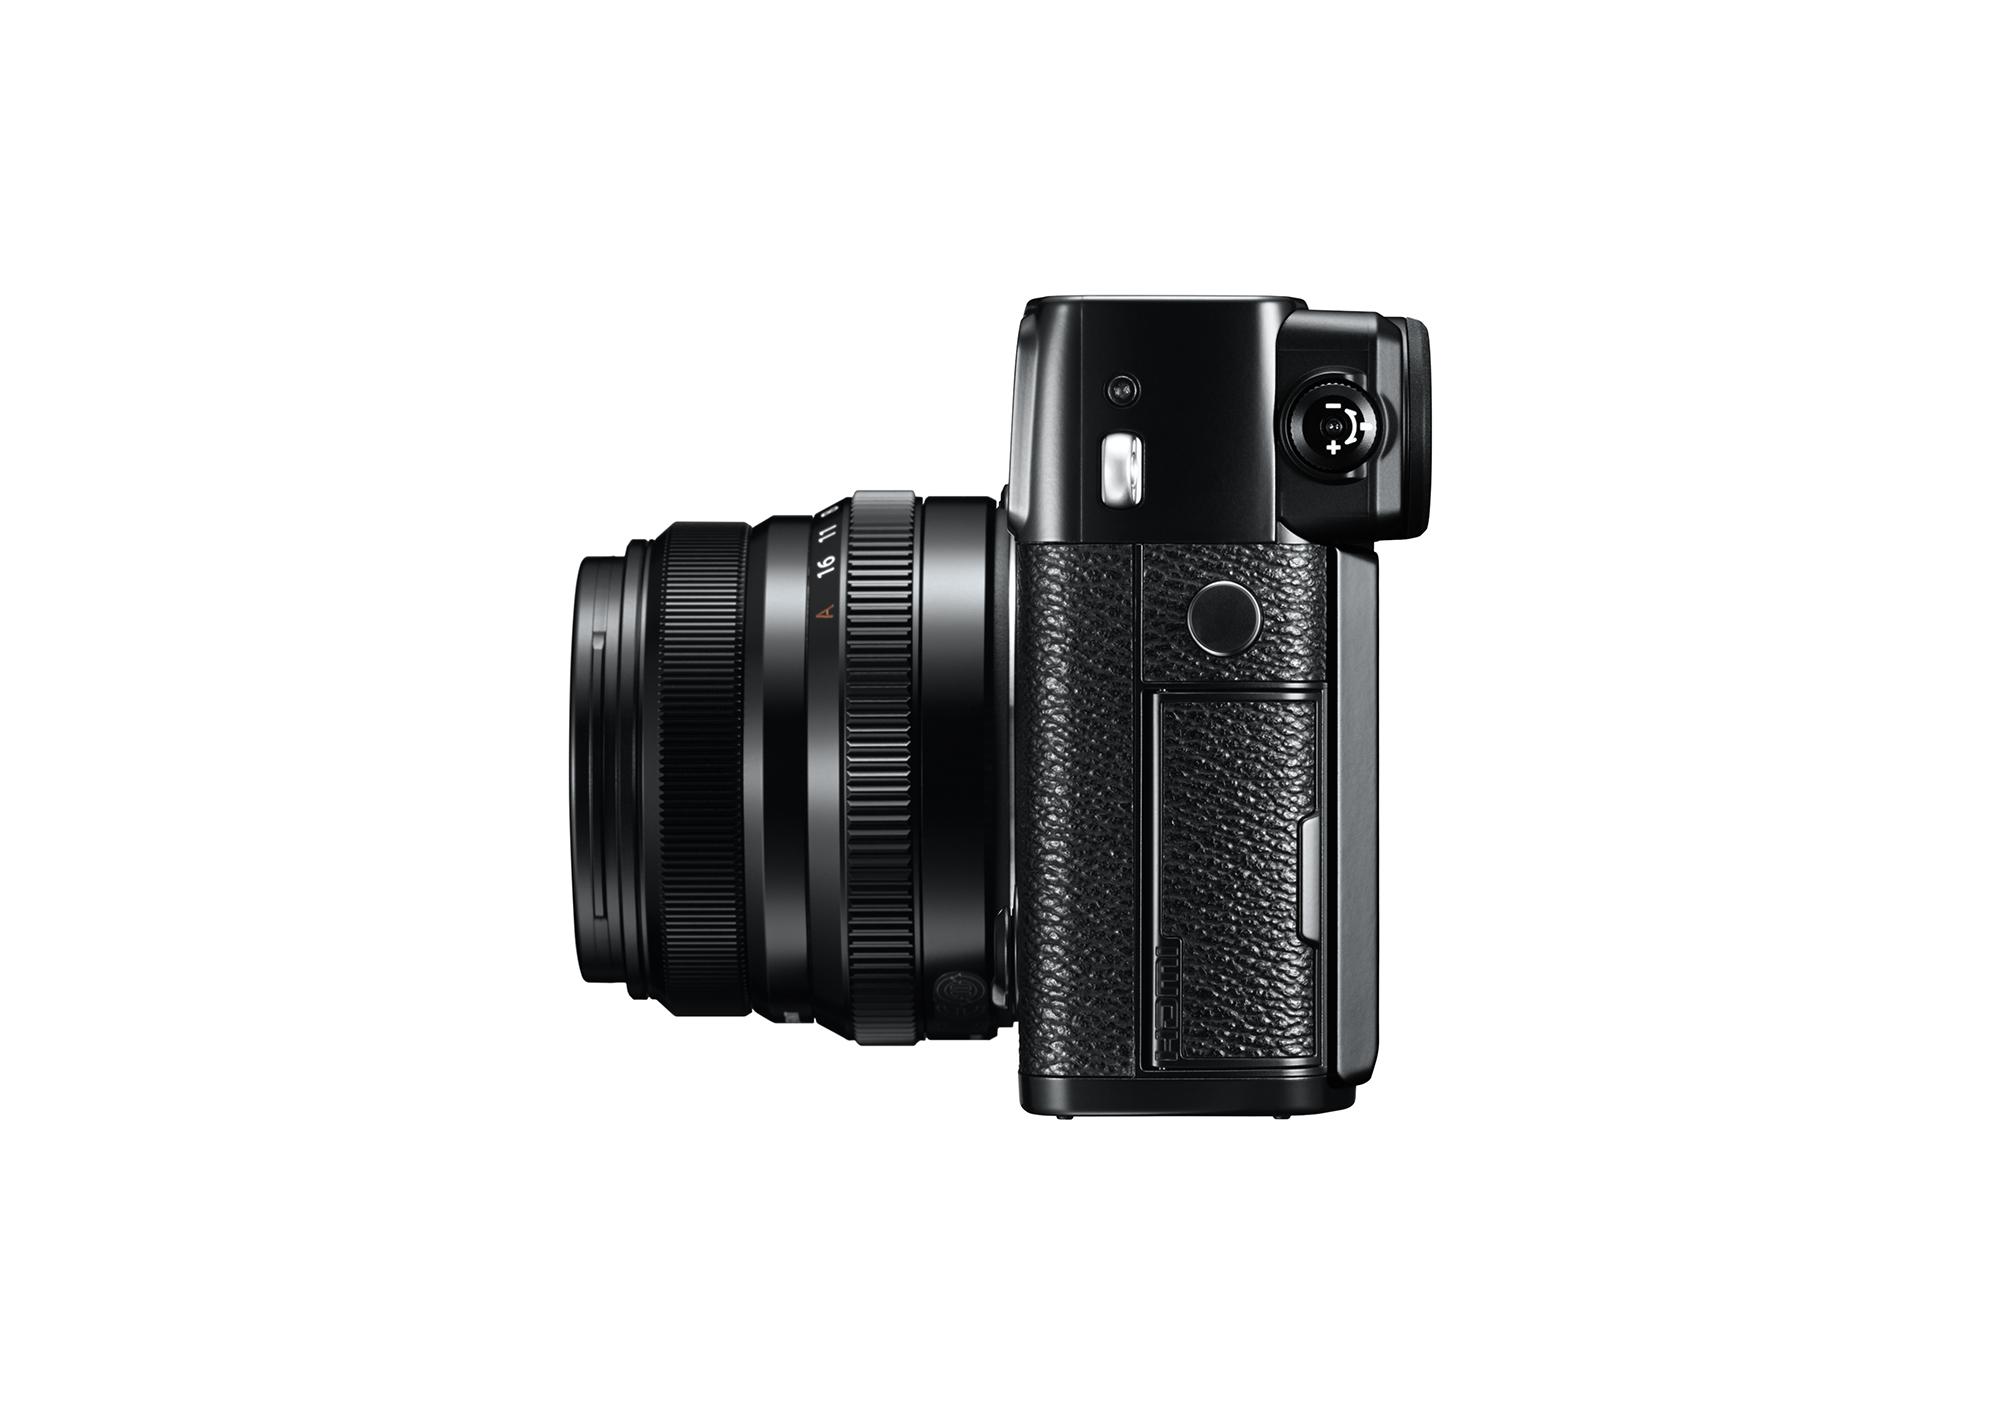 FujiFilm X Pro2 lato destro